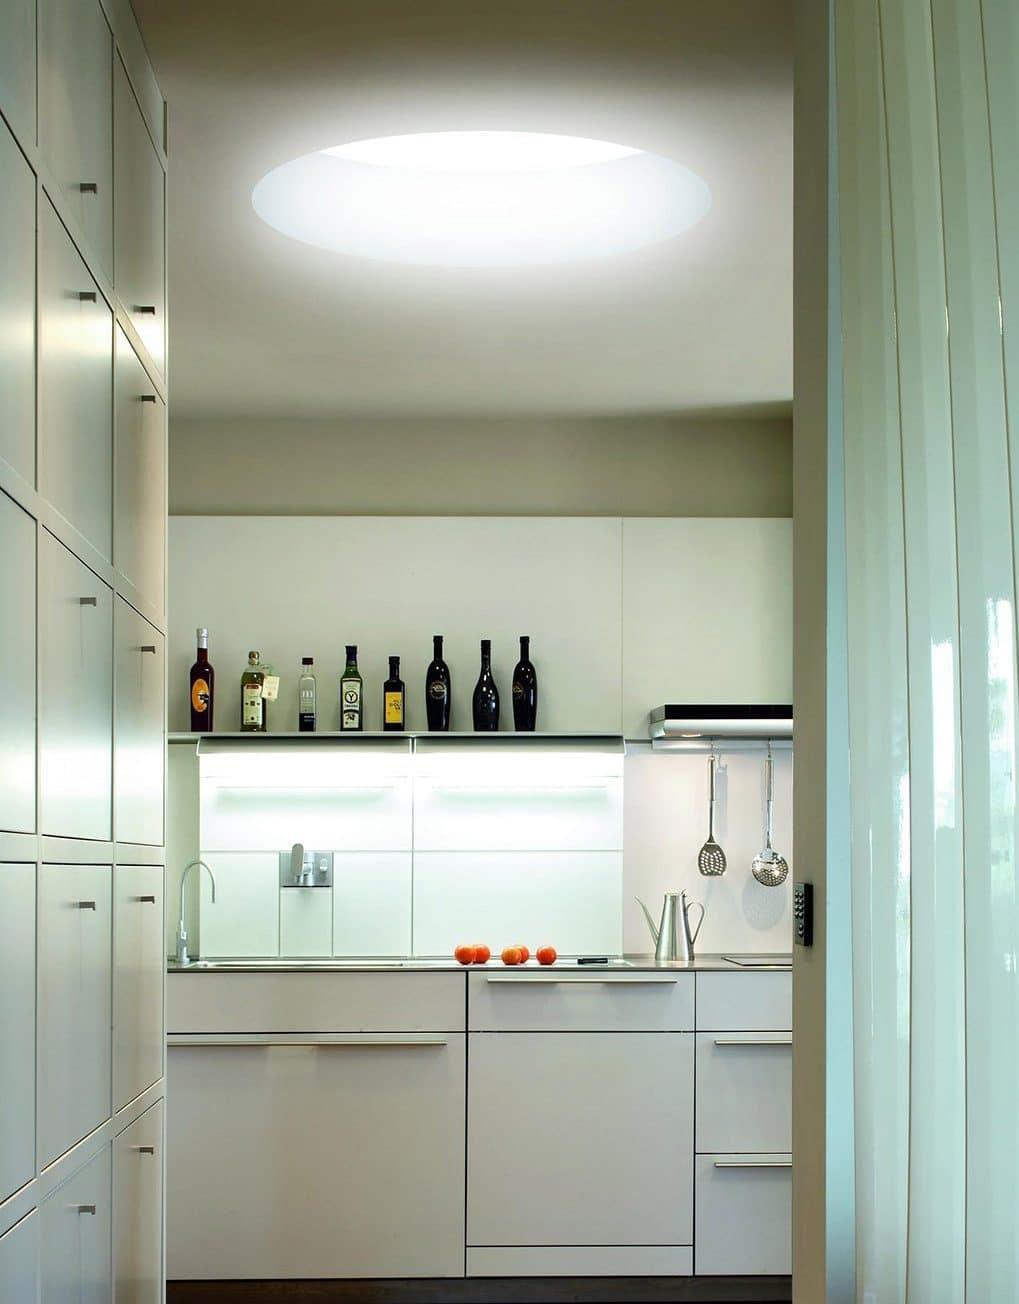 Iluminación interior cocina claraboya Sunlight de Maydisa